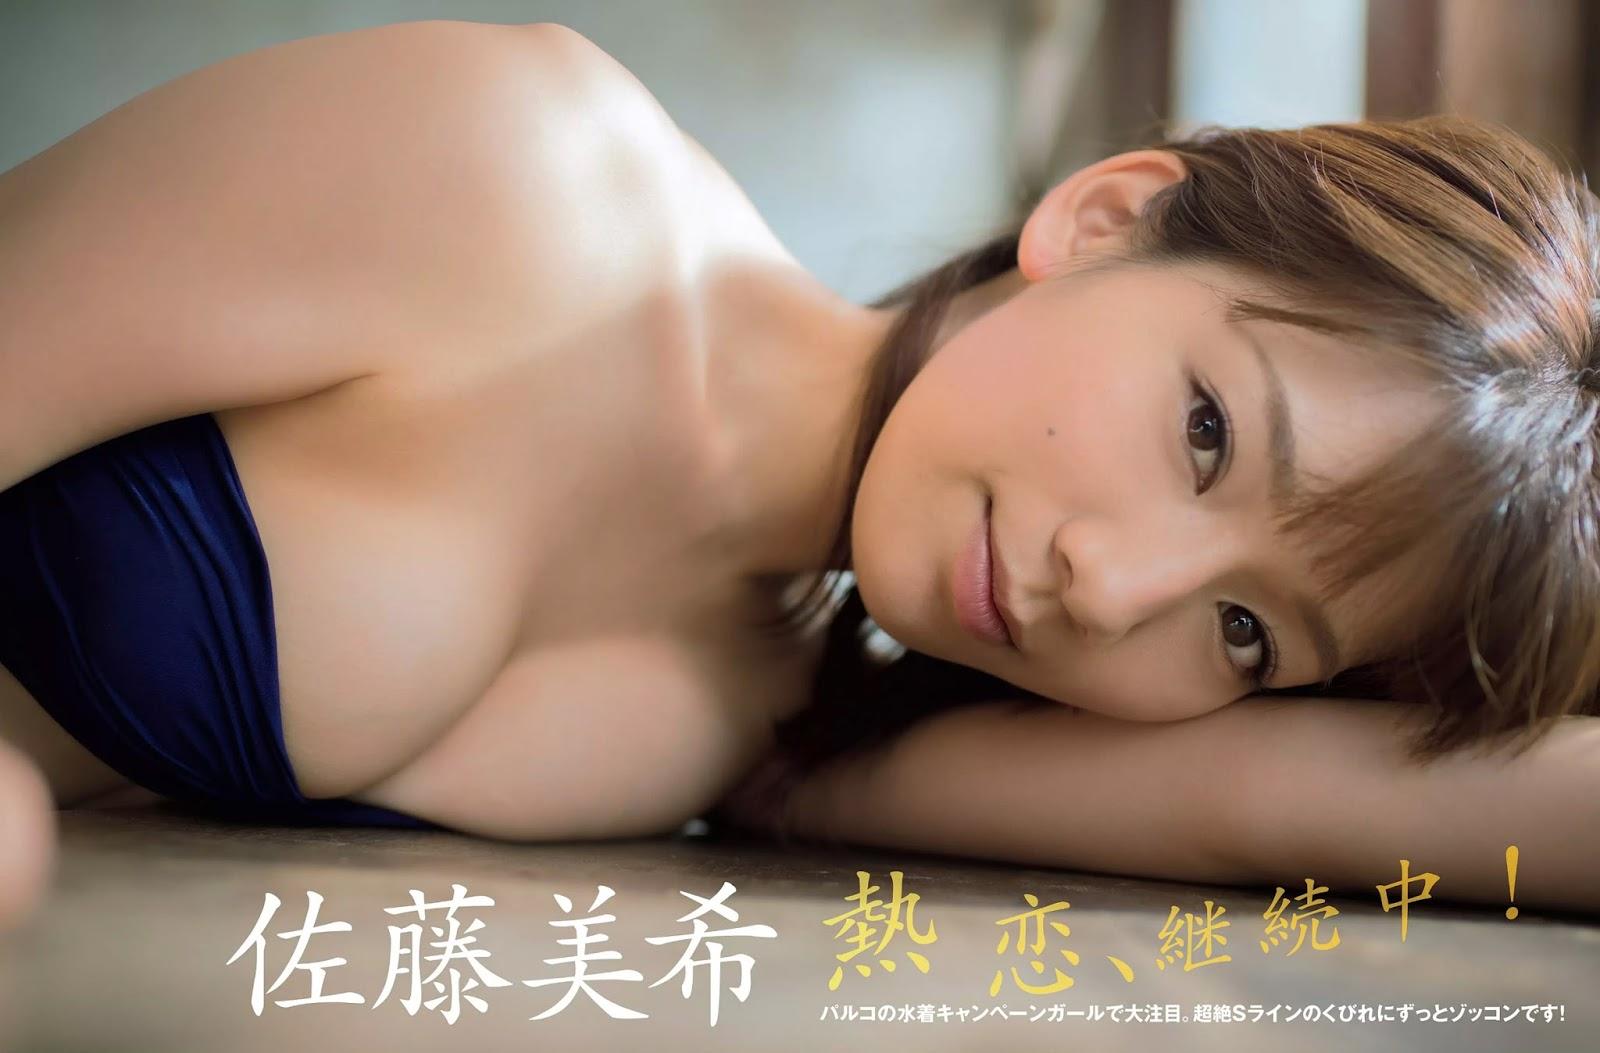 Miki Sato 佐藤美希, FLASH 電子版 2017.09.19 (フラッシュ 2017年09月19日号)